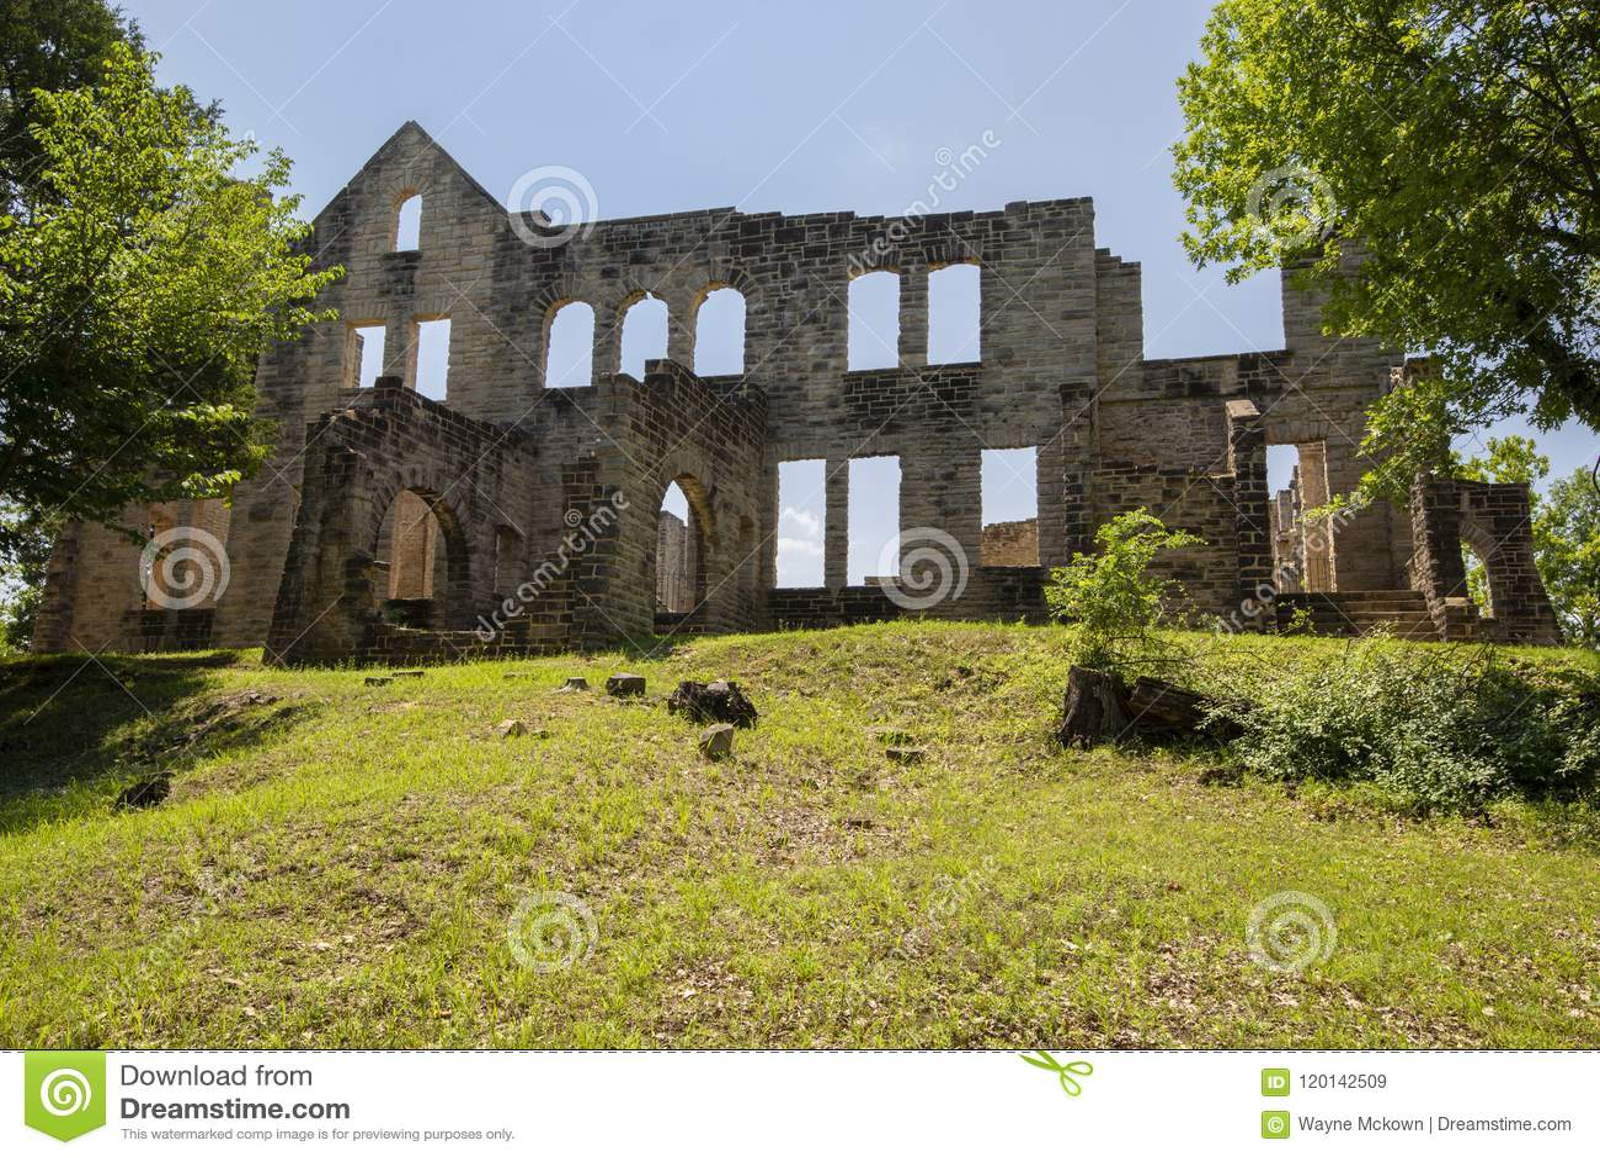 Ruínas do castelo do Ha Ha Tonka